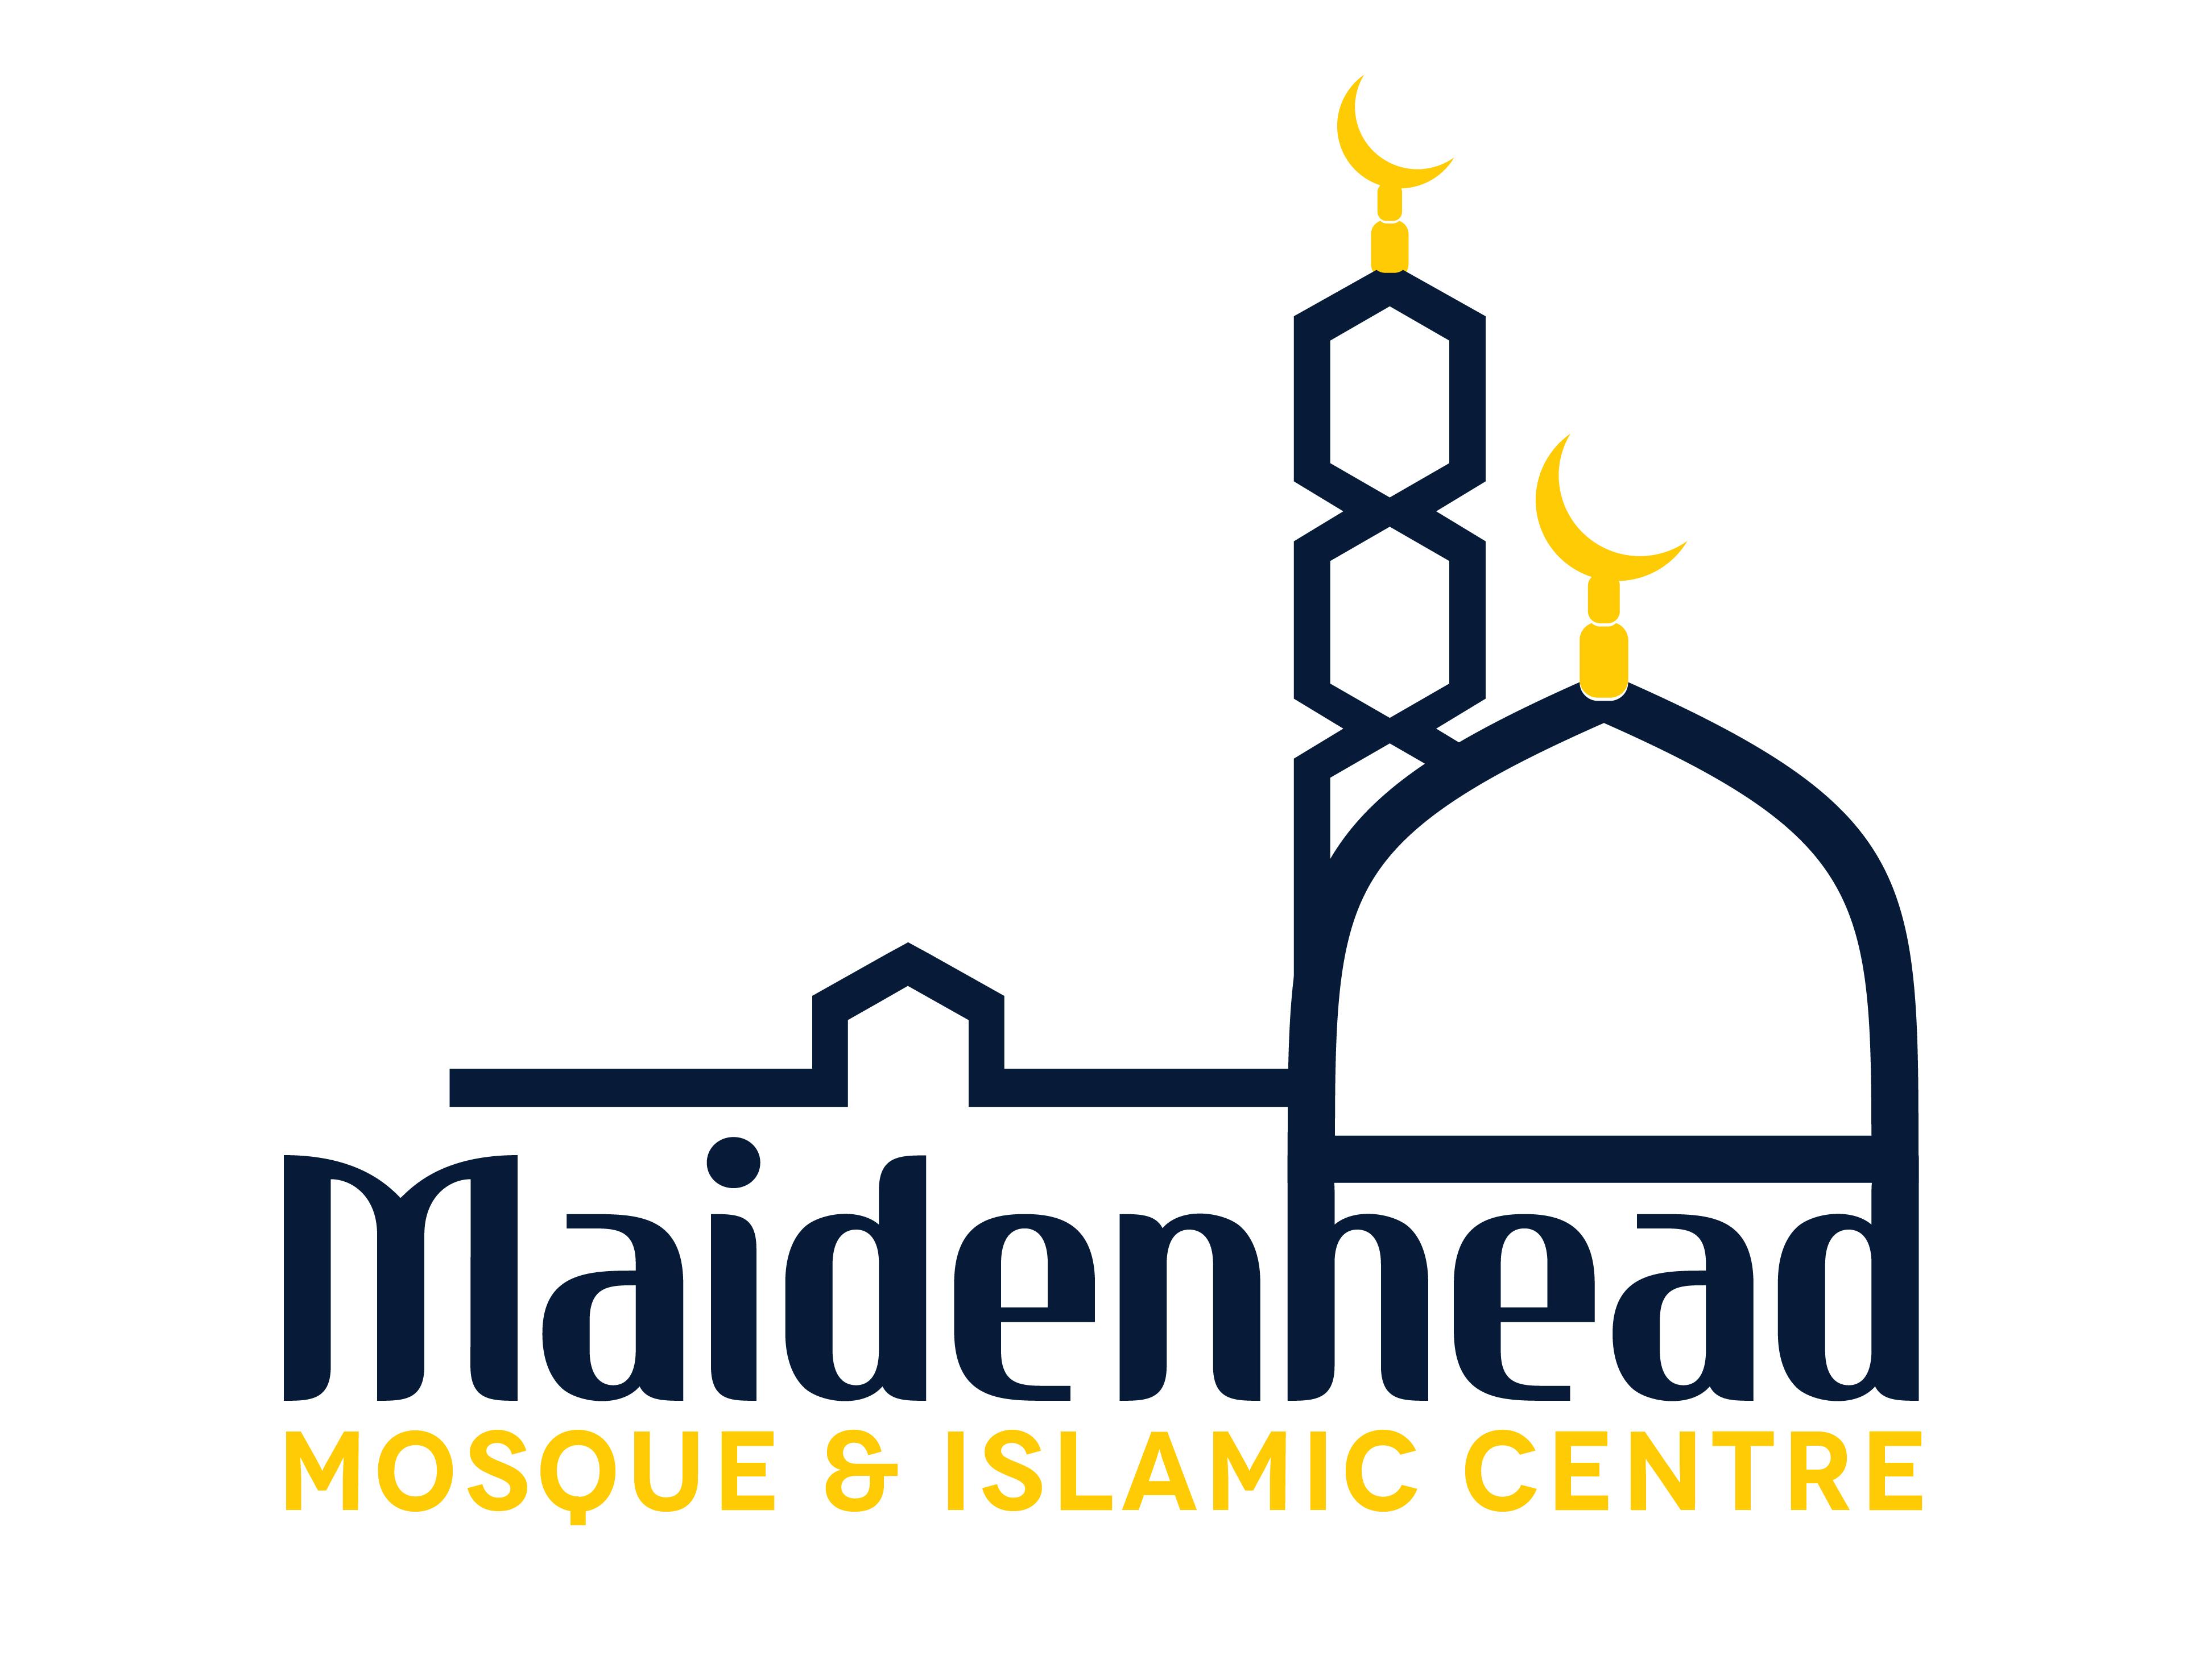 Maidenhead Mosque & Islamic Centre - Mosque & Islamic Centre